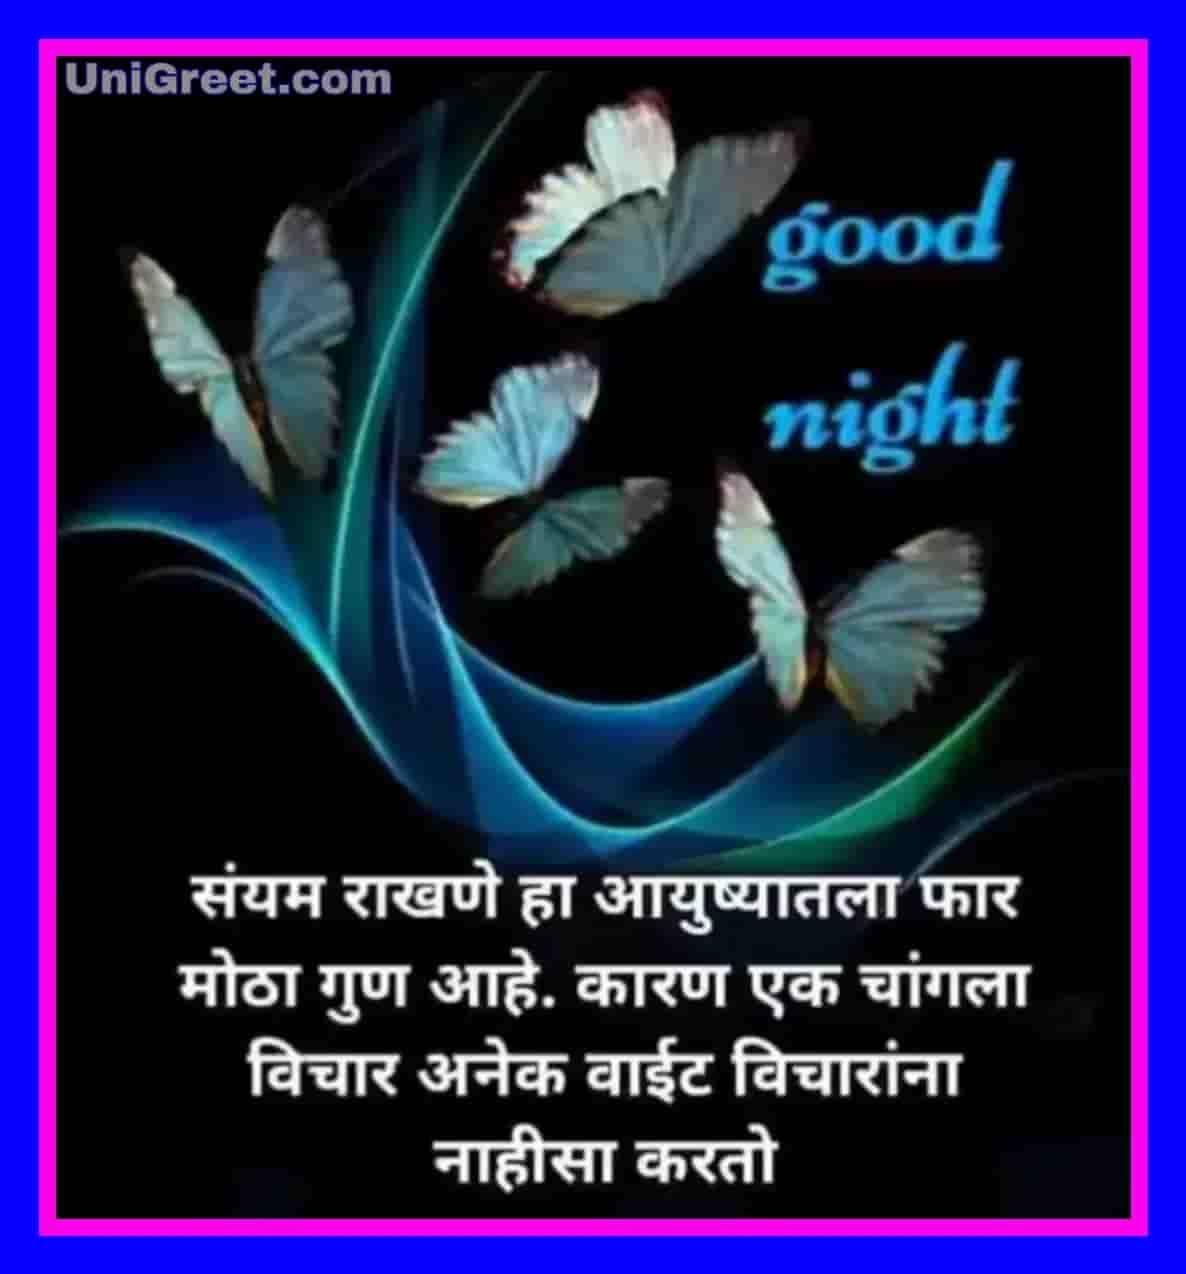 Good Night Marathi Images in 2020 Beautiful good night